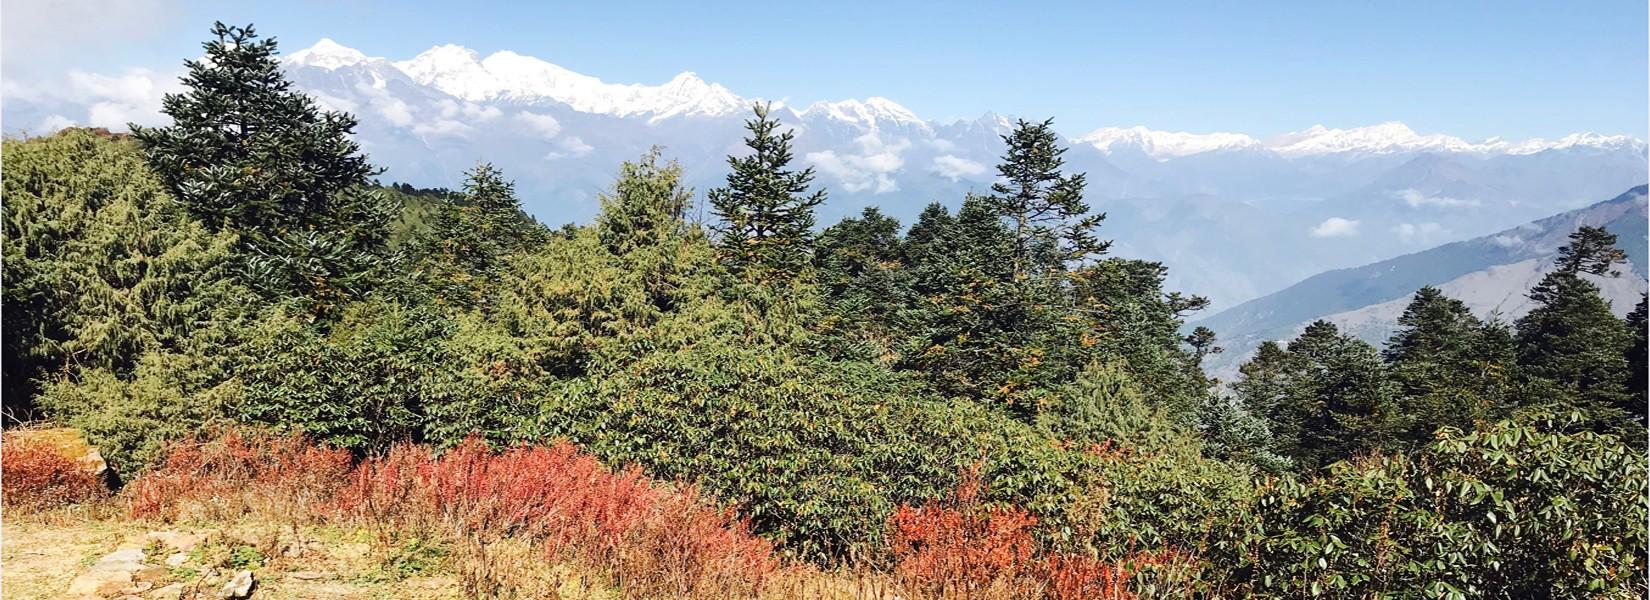 Langtang Valley Gosaikunda Trekking